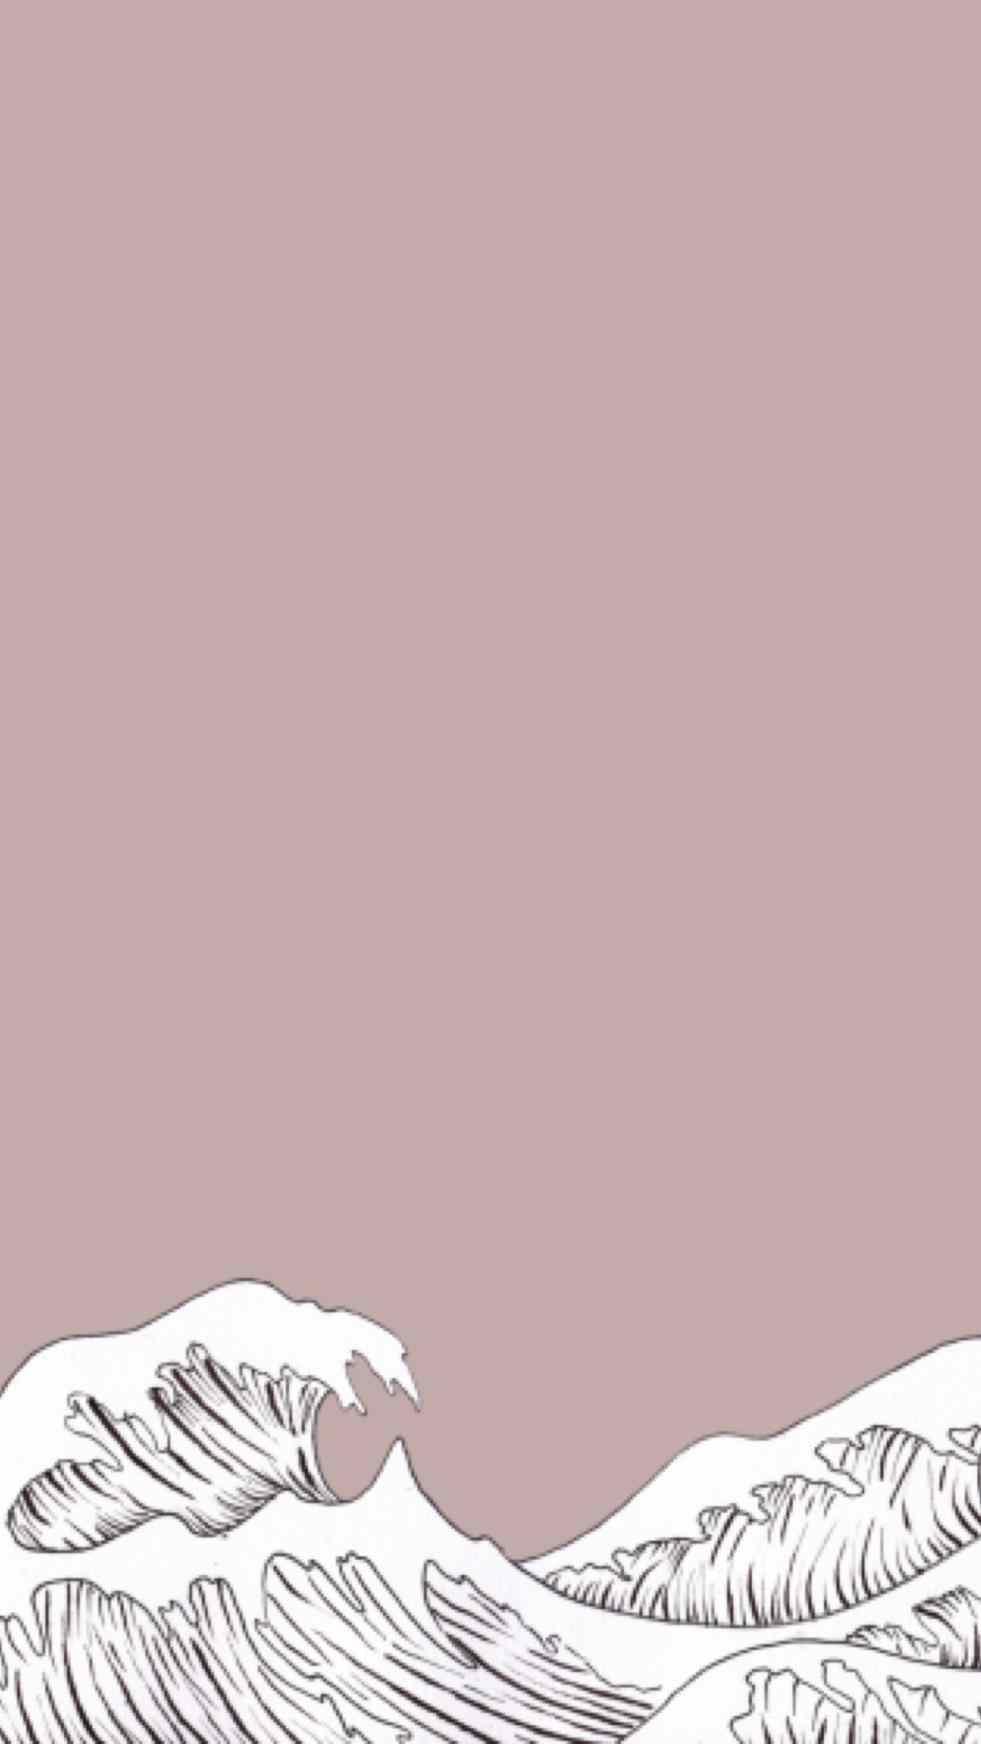 Aesthetic Tumblr Wallpapers Wallpaper Cave